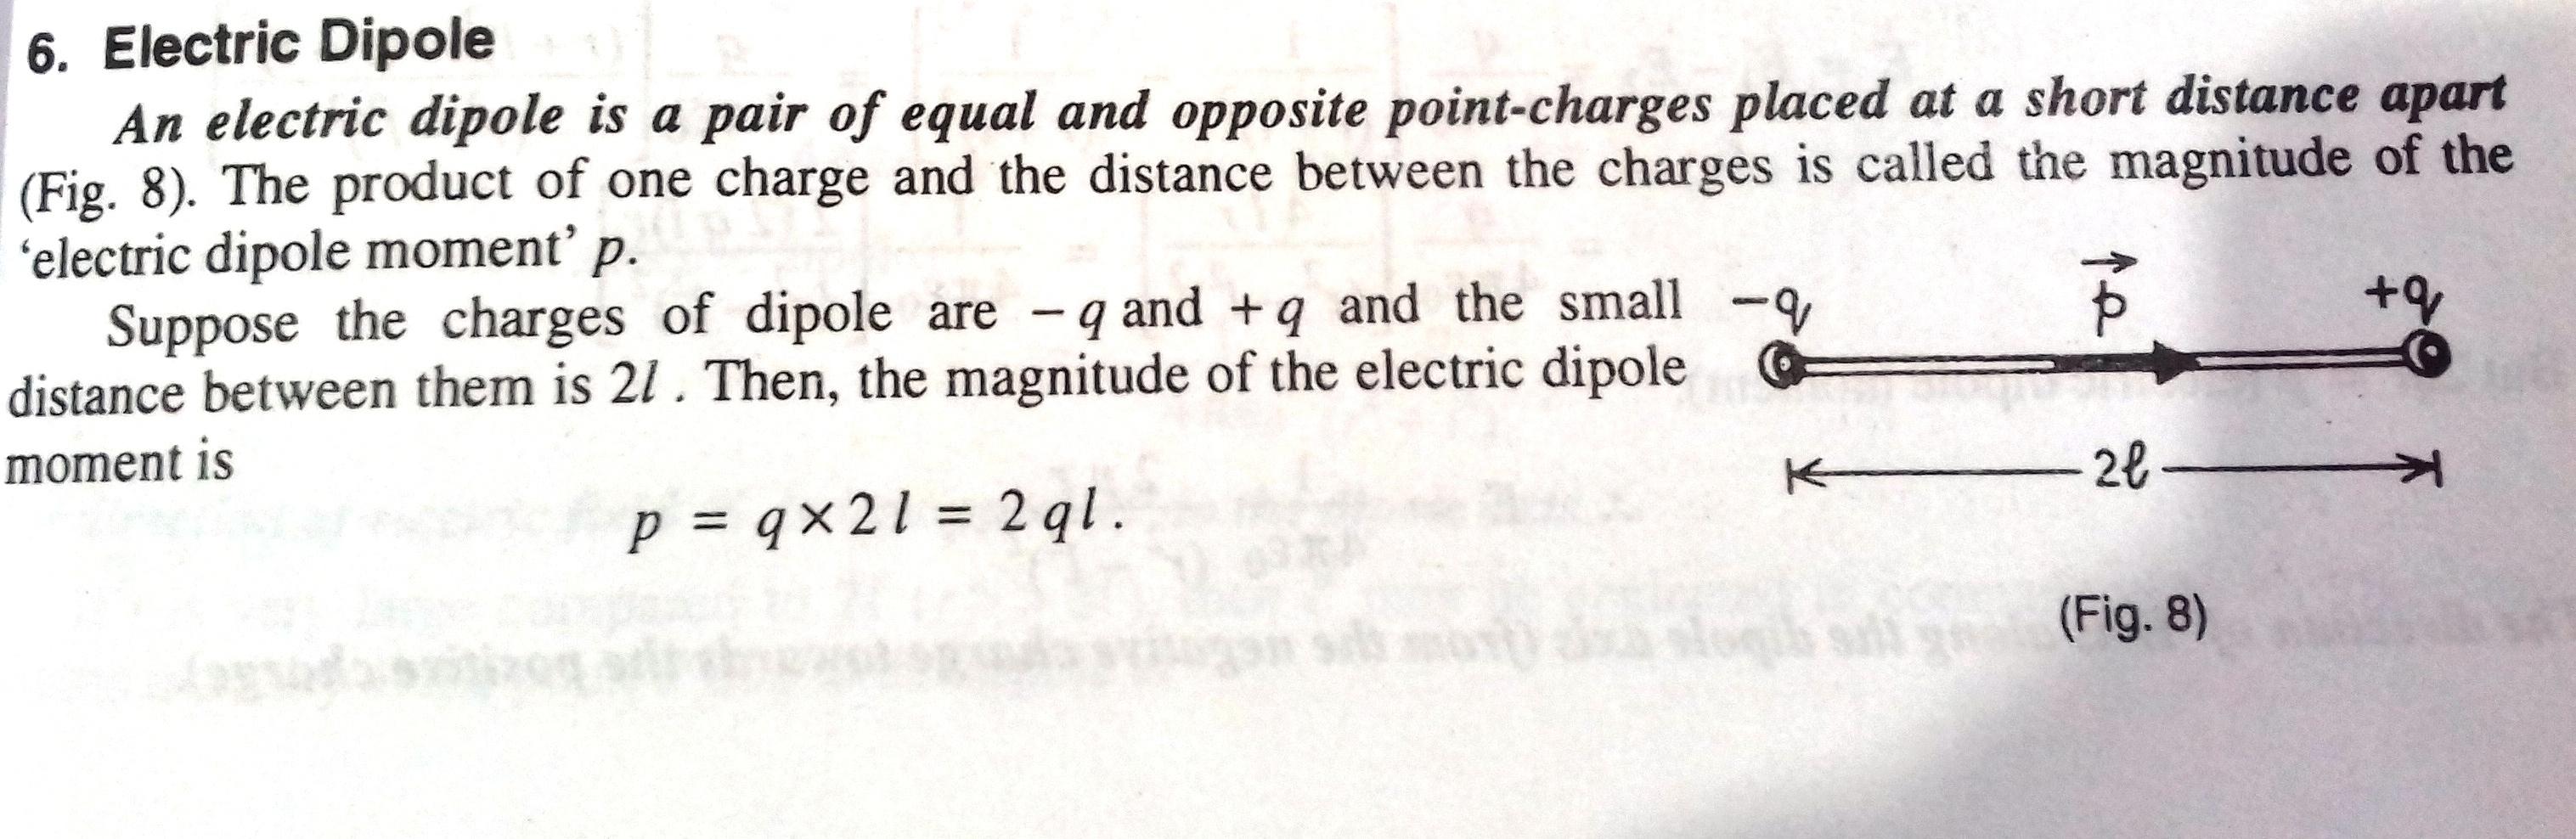 Electric Dipole in Electrostatics